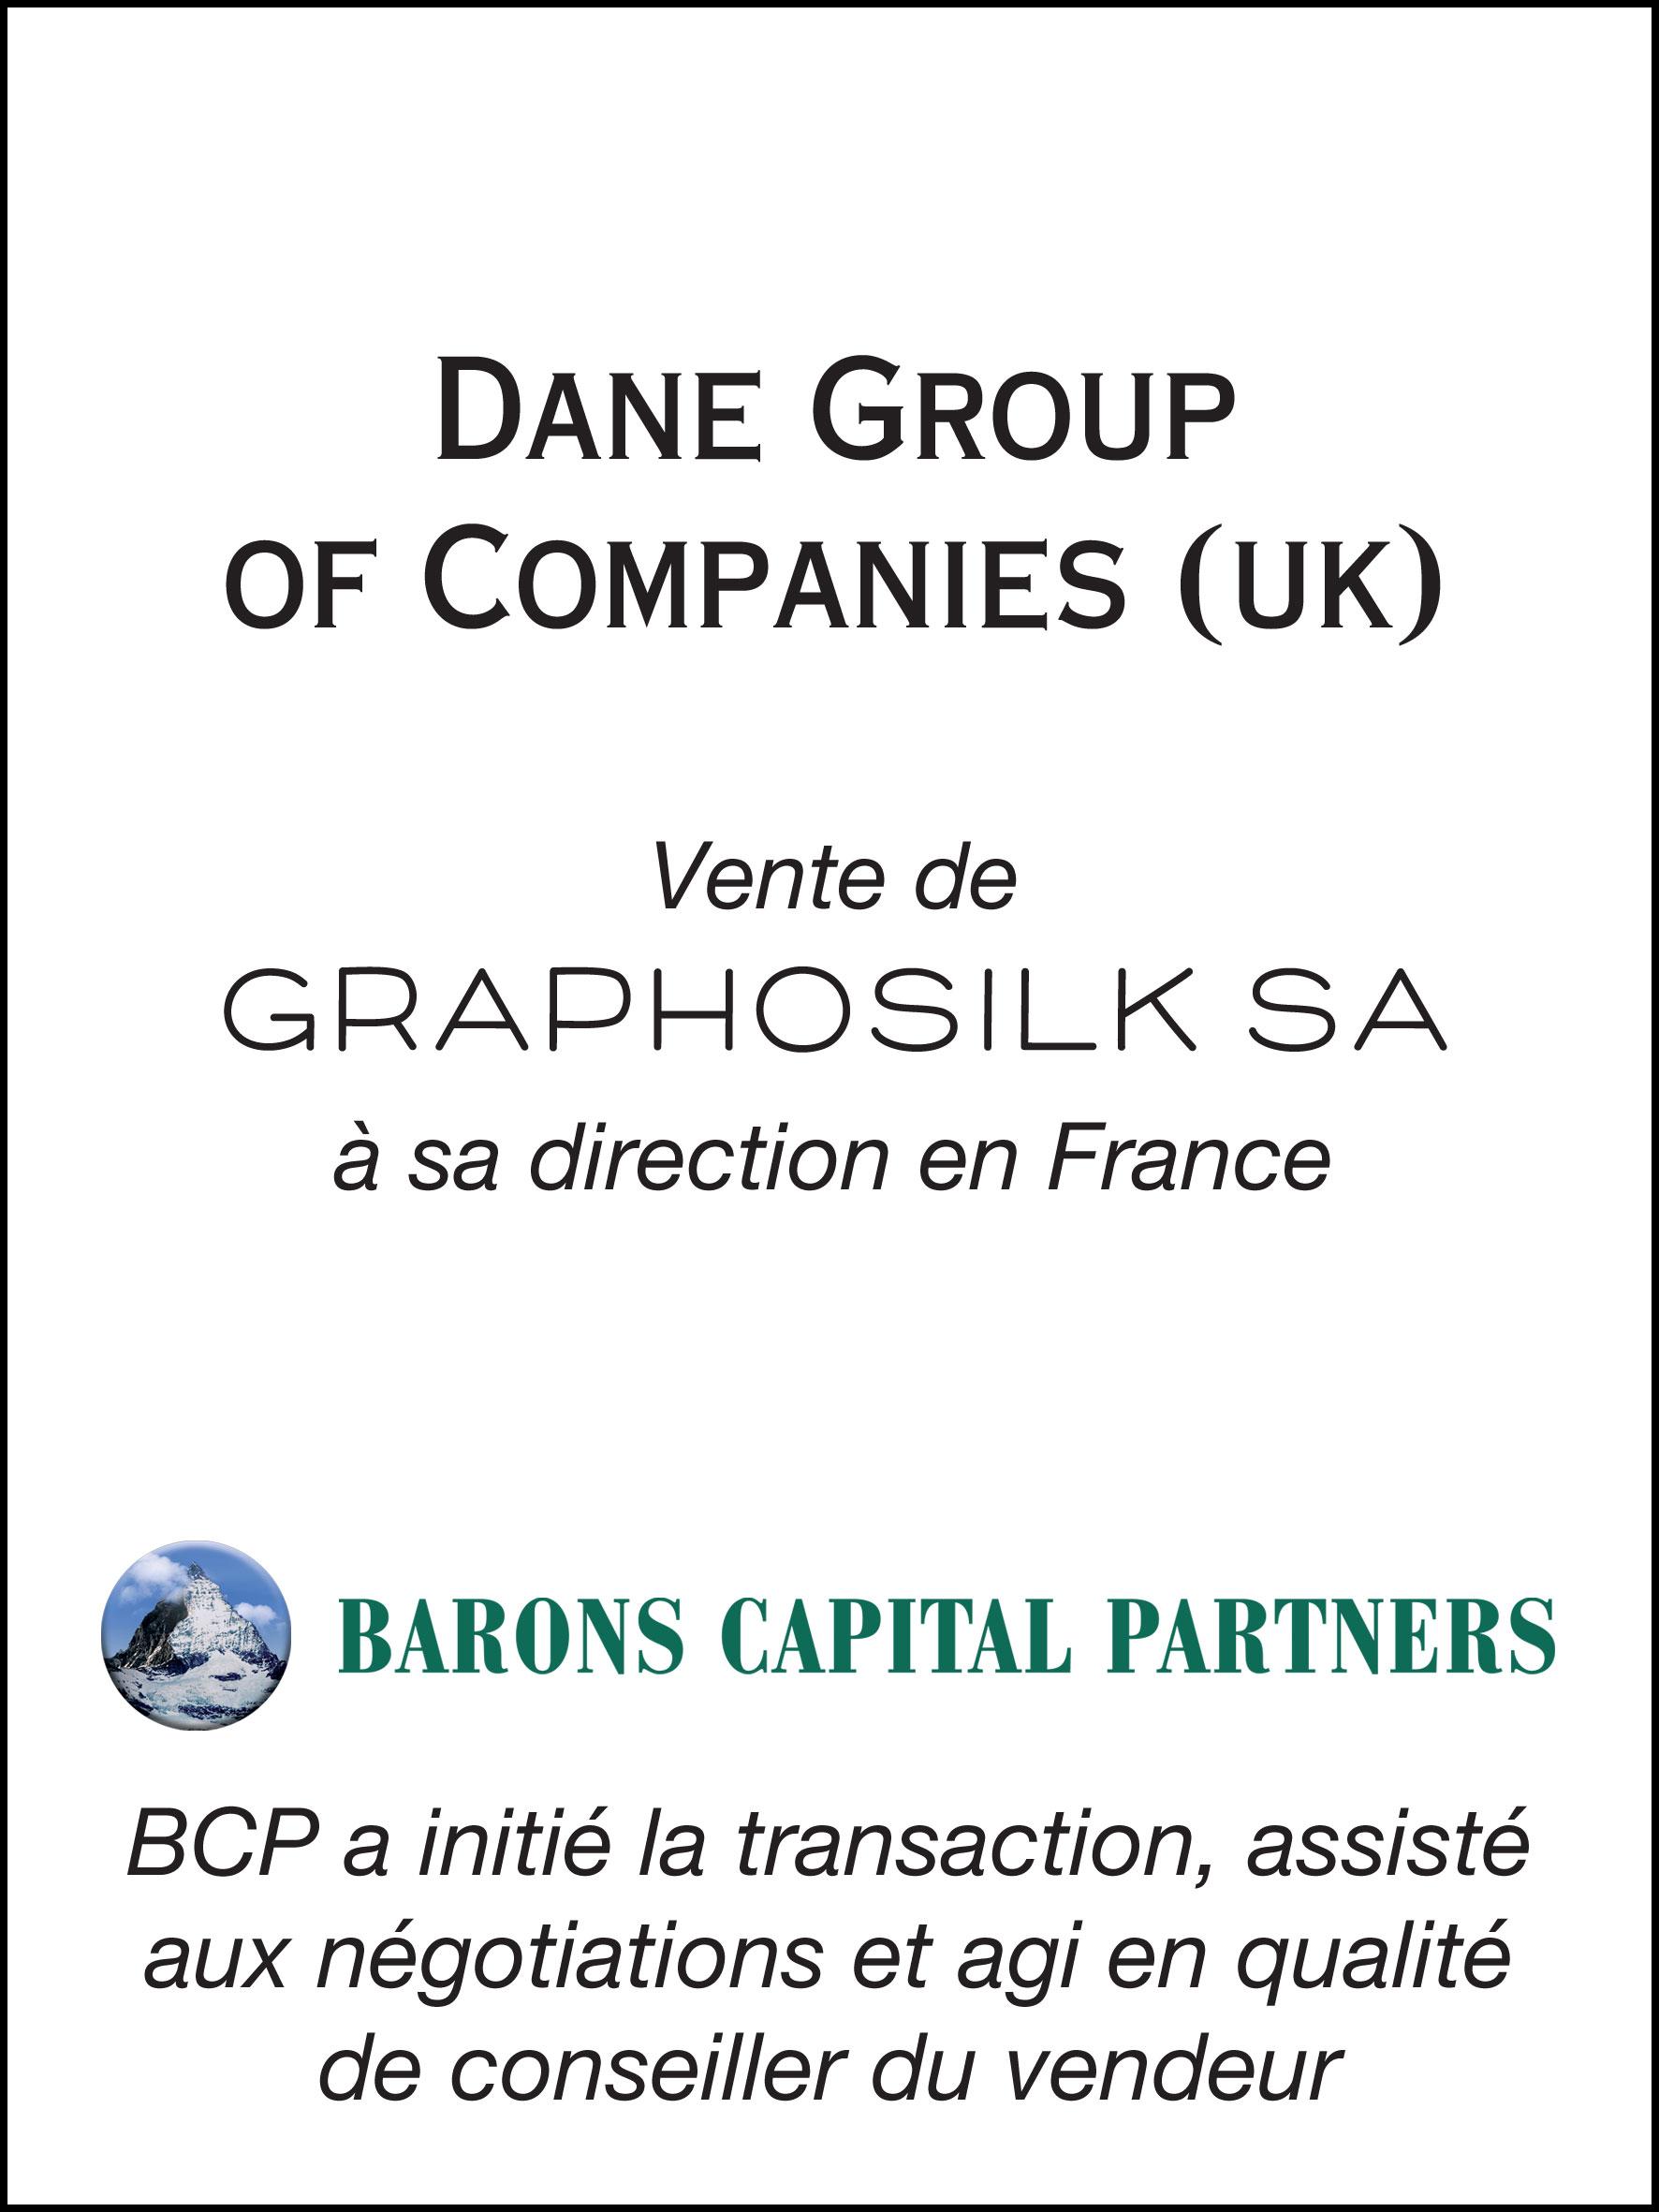 23_Dane Group of Companies (UK)_F